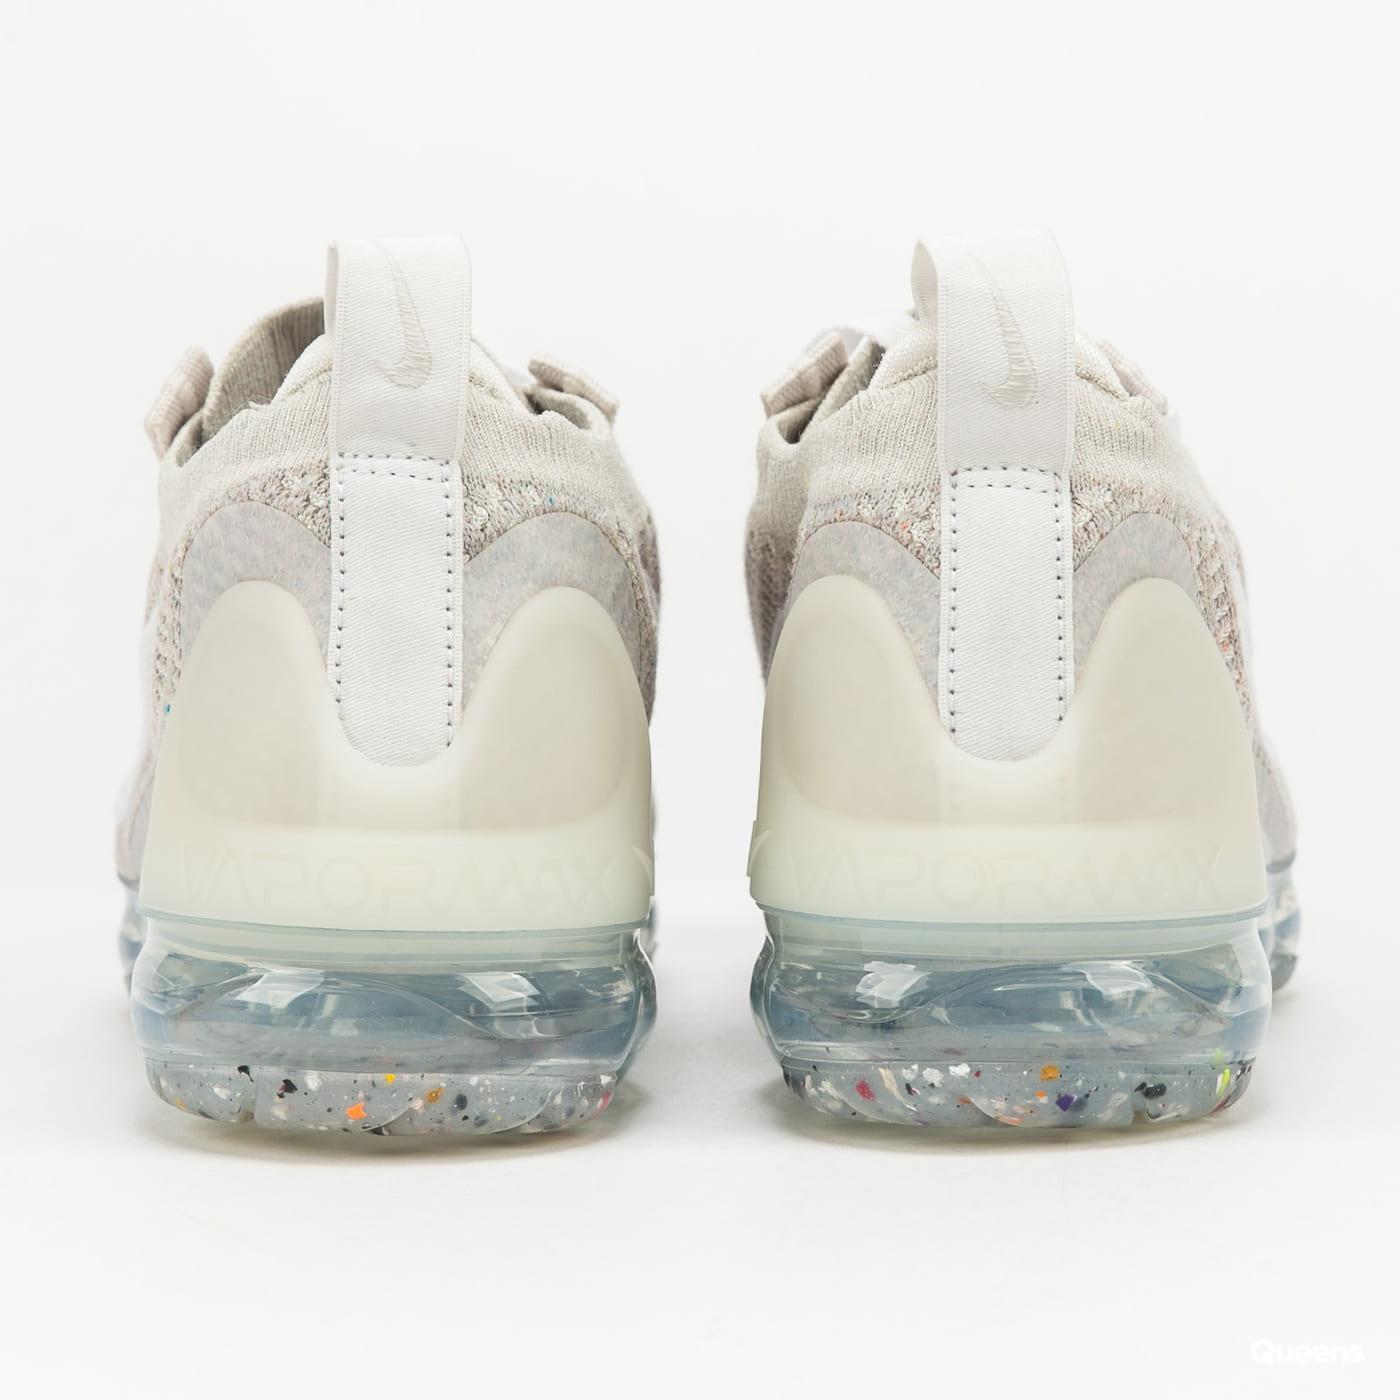 Nike W Air Vapormax 2021 FK light bone / white - phantom